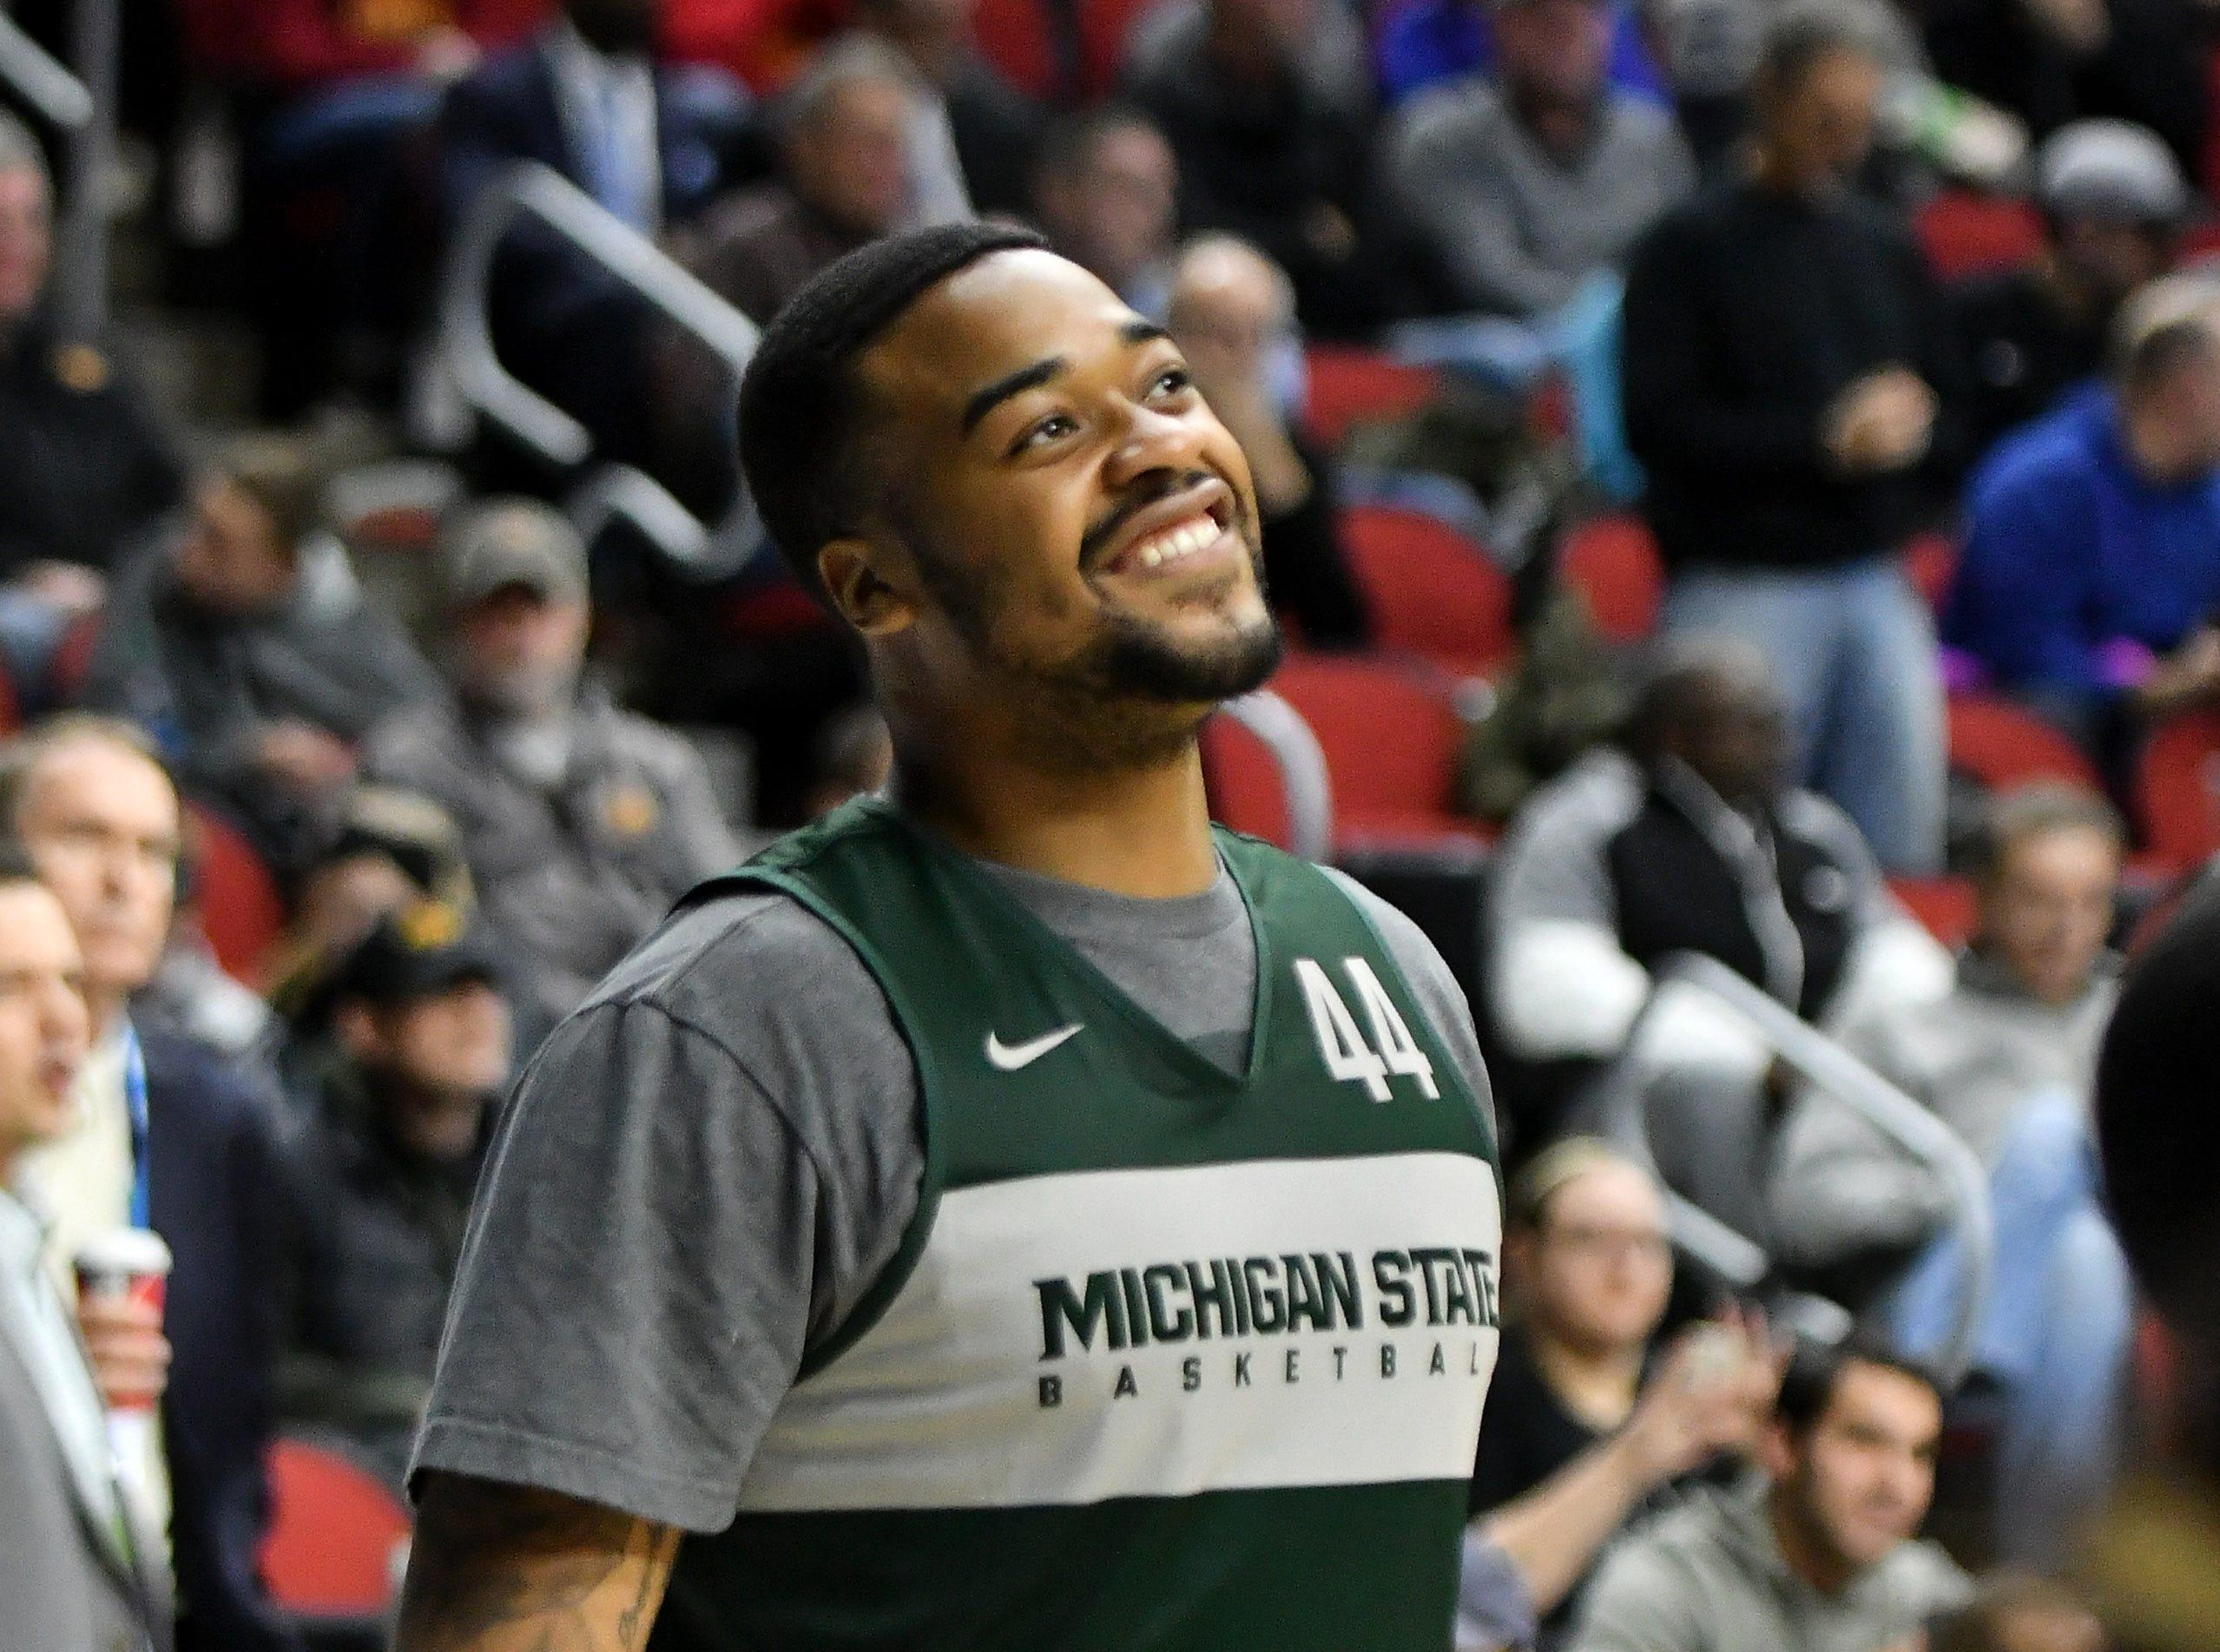 Michigan State forward Nick Ward smiles during practice.